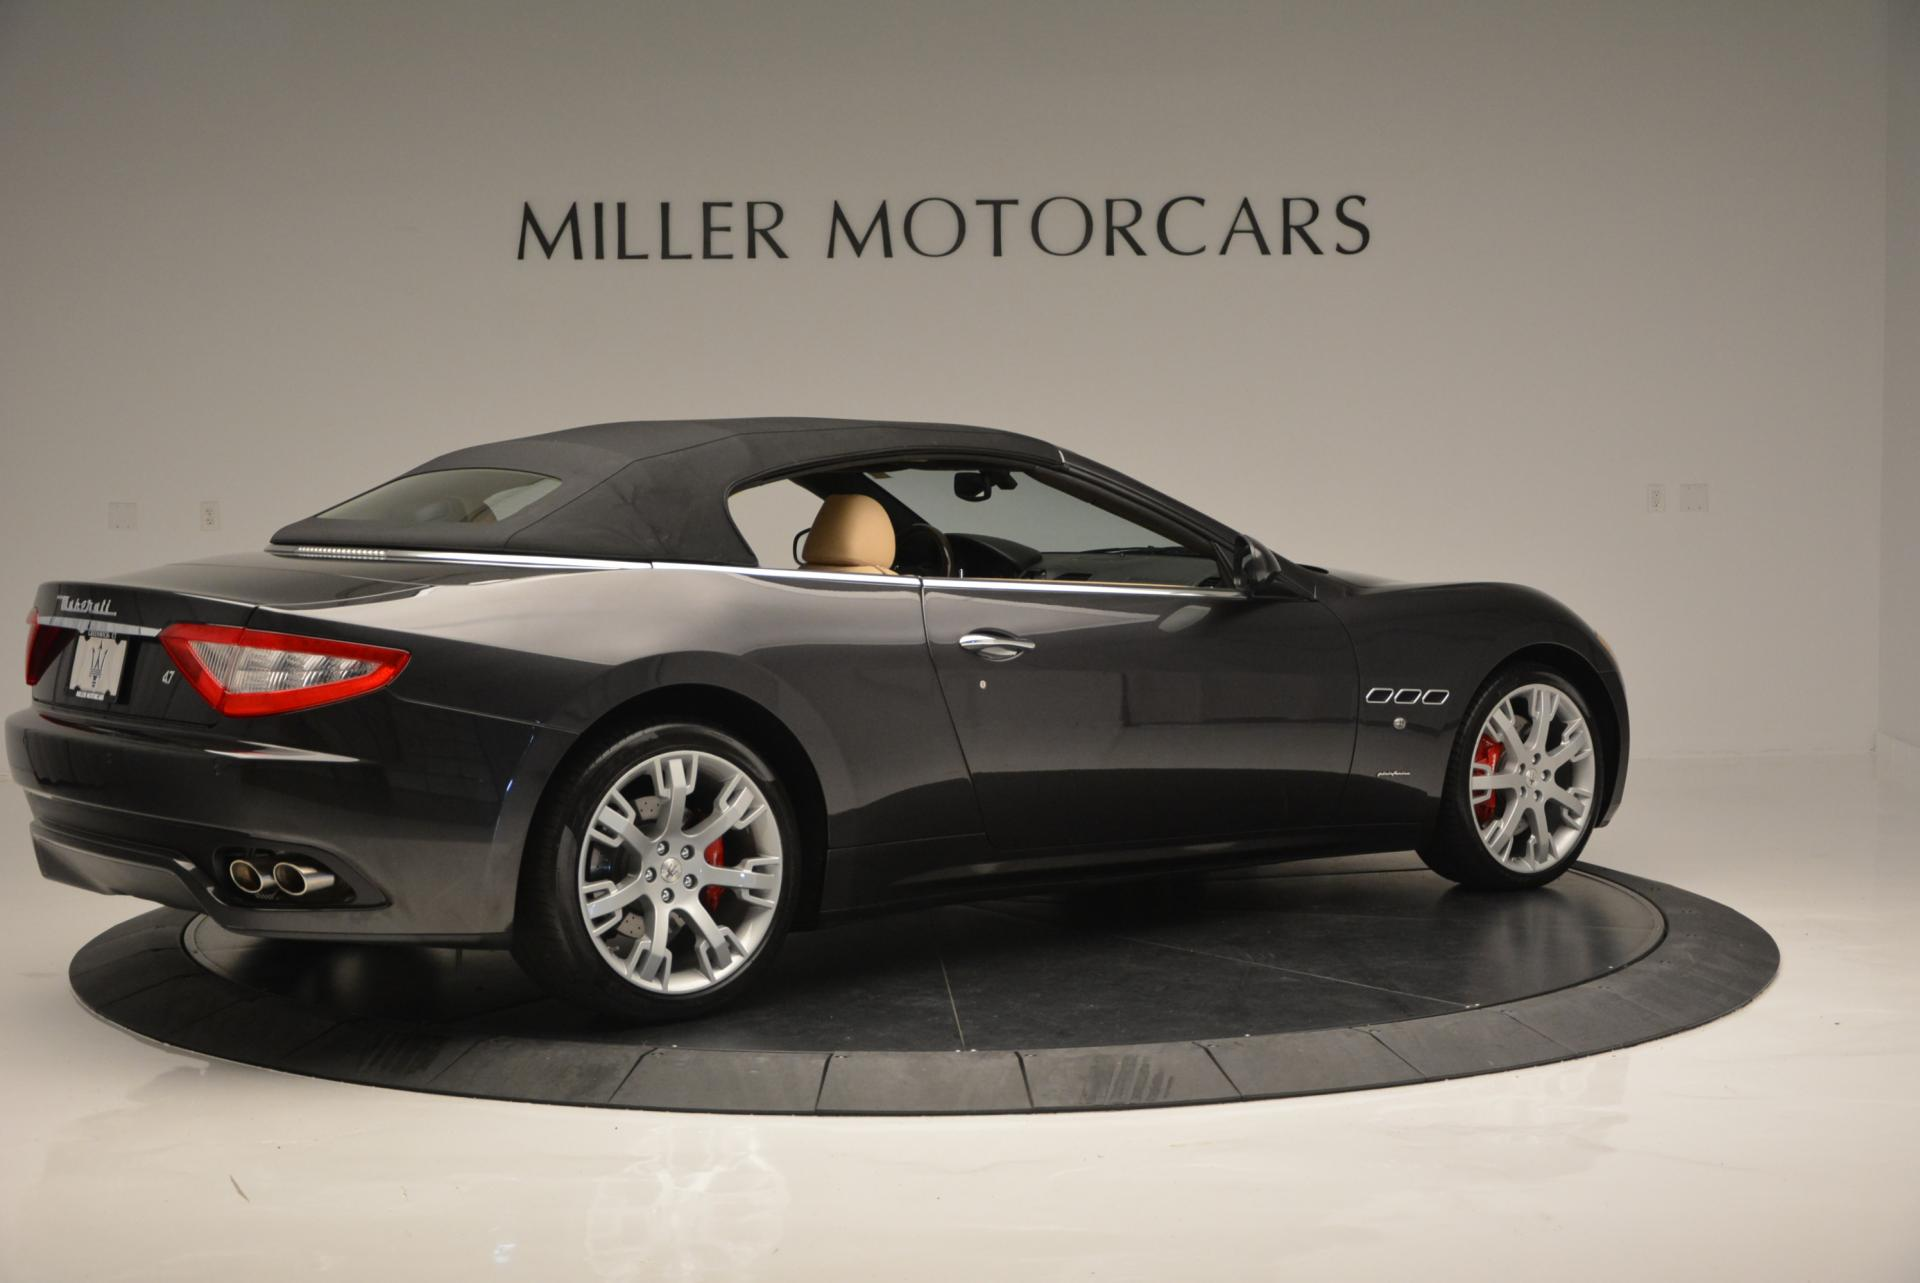 Used 2011 Maserati GranTurismo Base For Sale In Westport, CT 158_p20